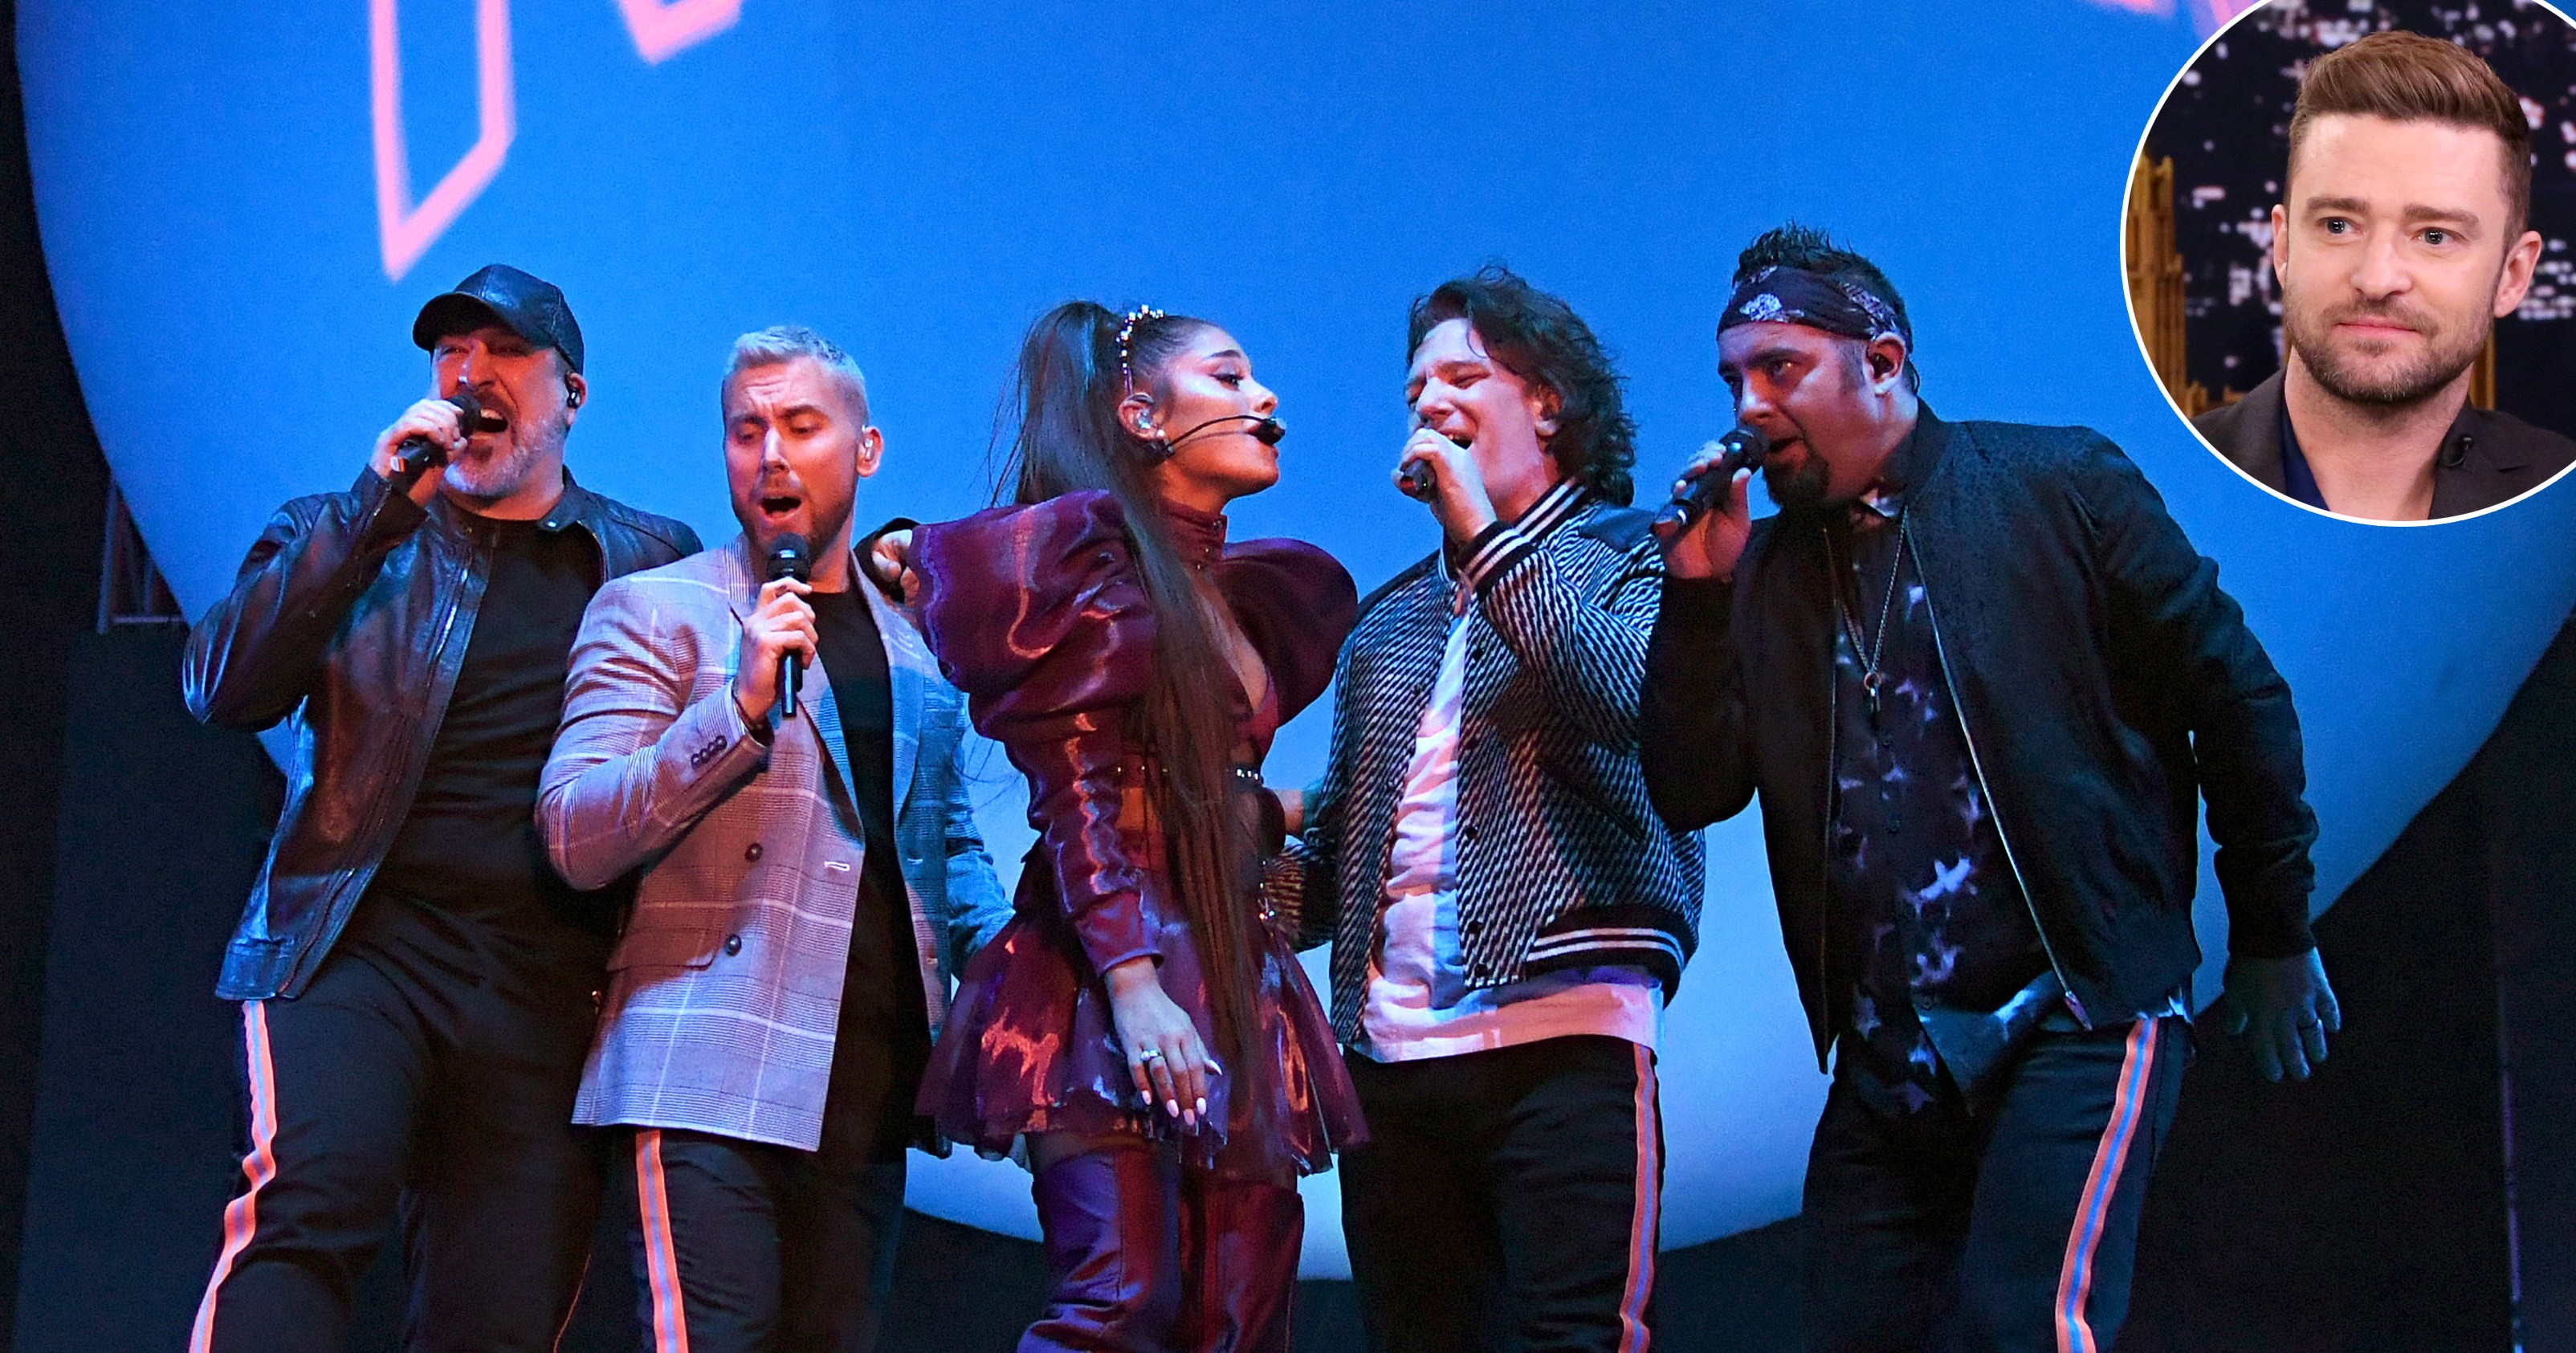 Joey Fatone: Why Justin Didn't Perform With Ariana, 'NSync at Coachella